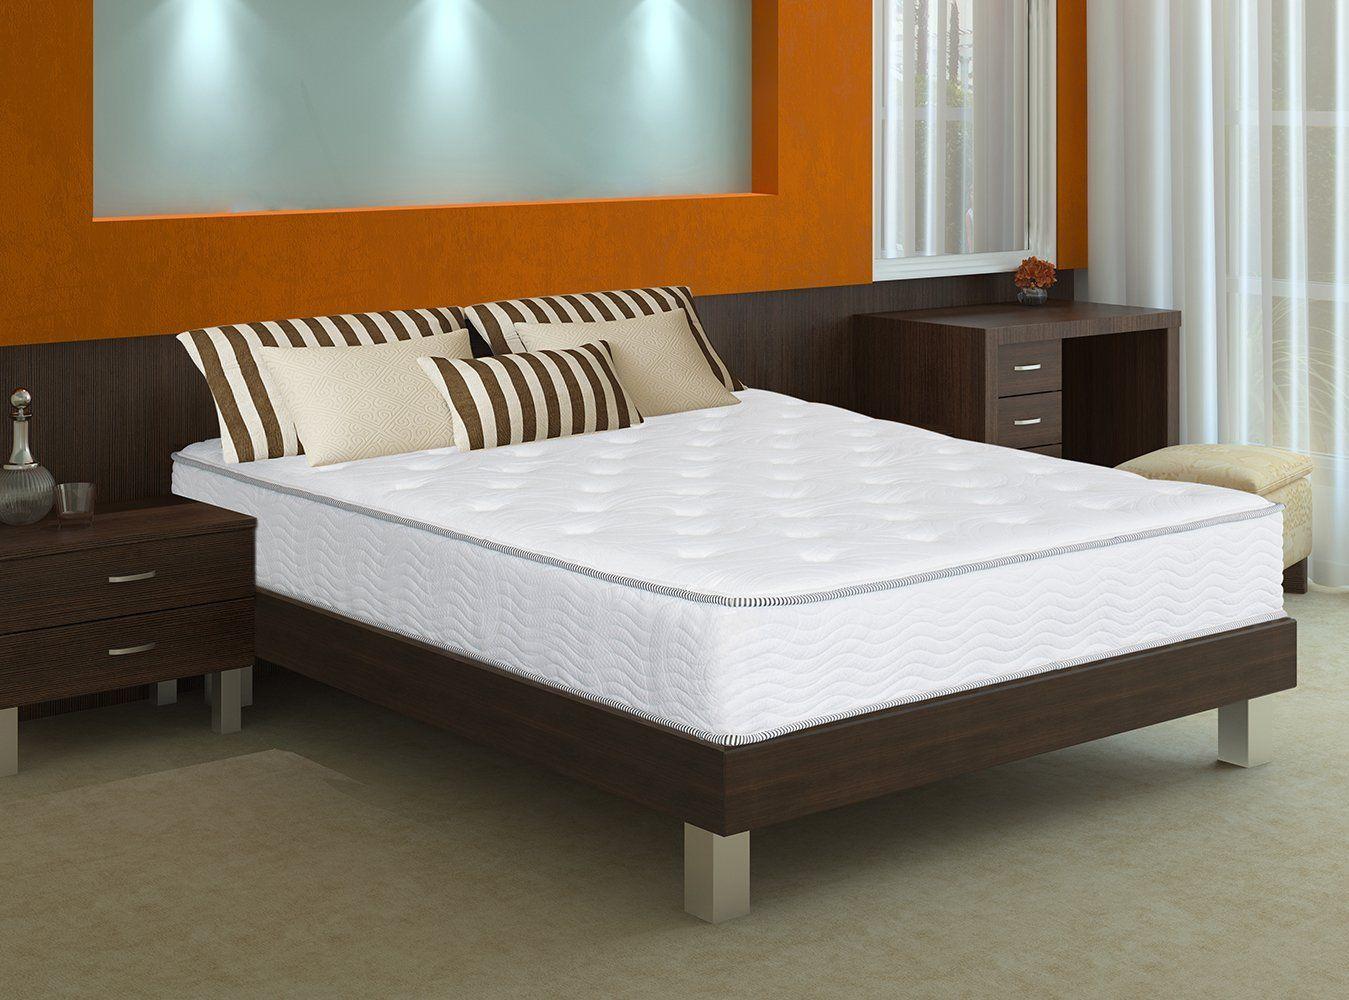 safavieh dream collection serenity white and grey spring mattress